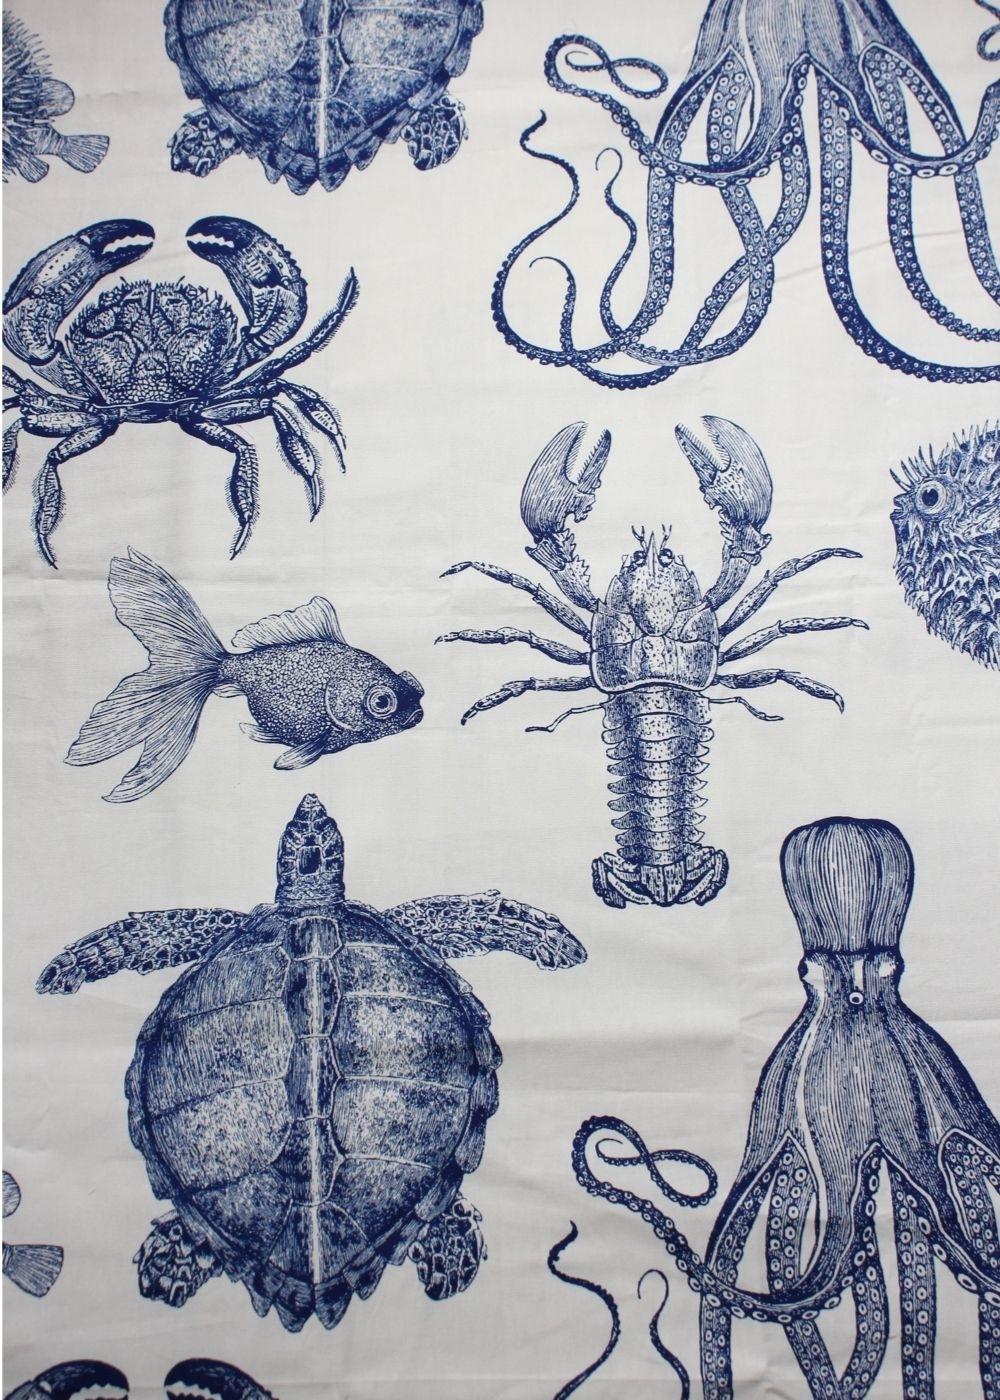 Diy Sea Life Wall Art – Broken Wall Art Gets A New Life With This For Latest Sea Life Wall Art (View 4 of 15)